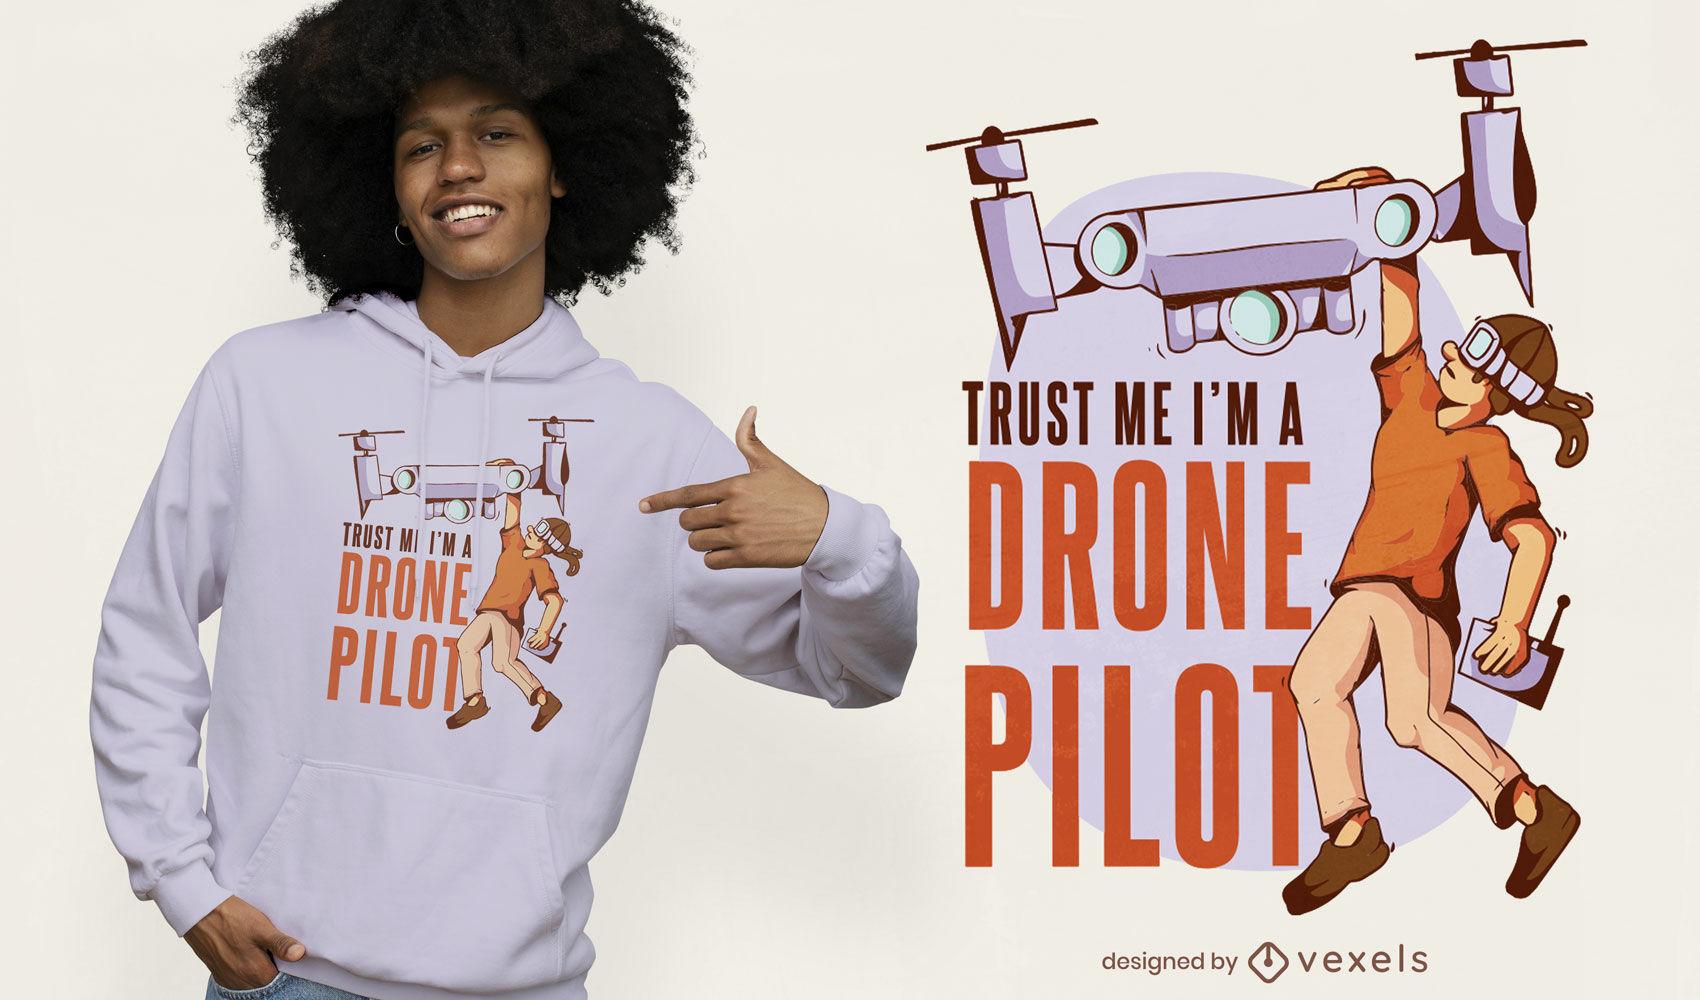 Drone pilot t-shirt design